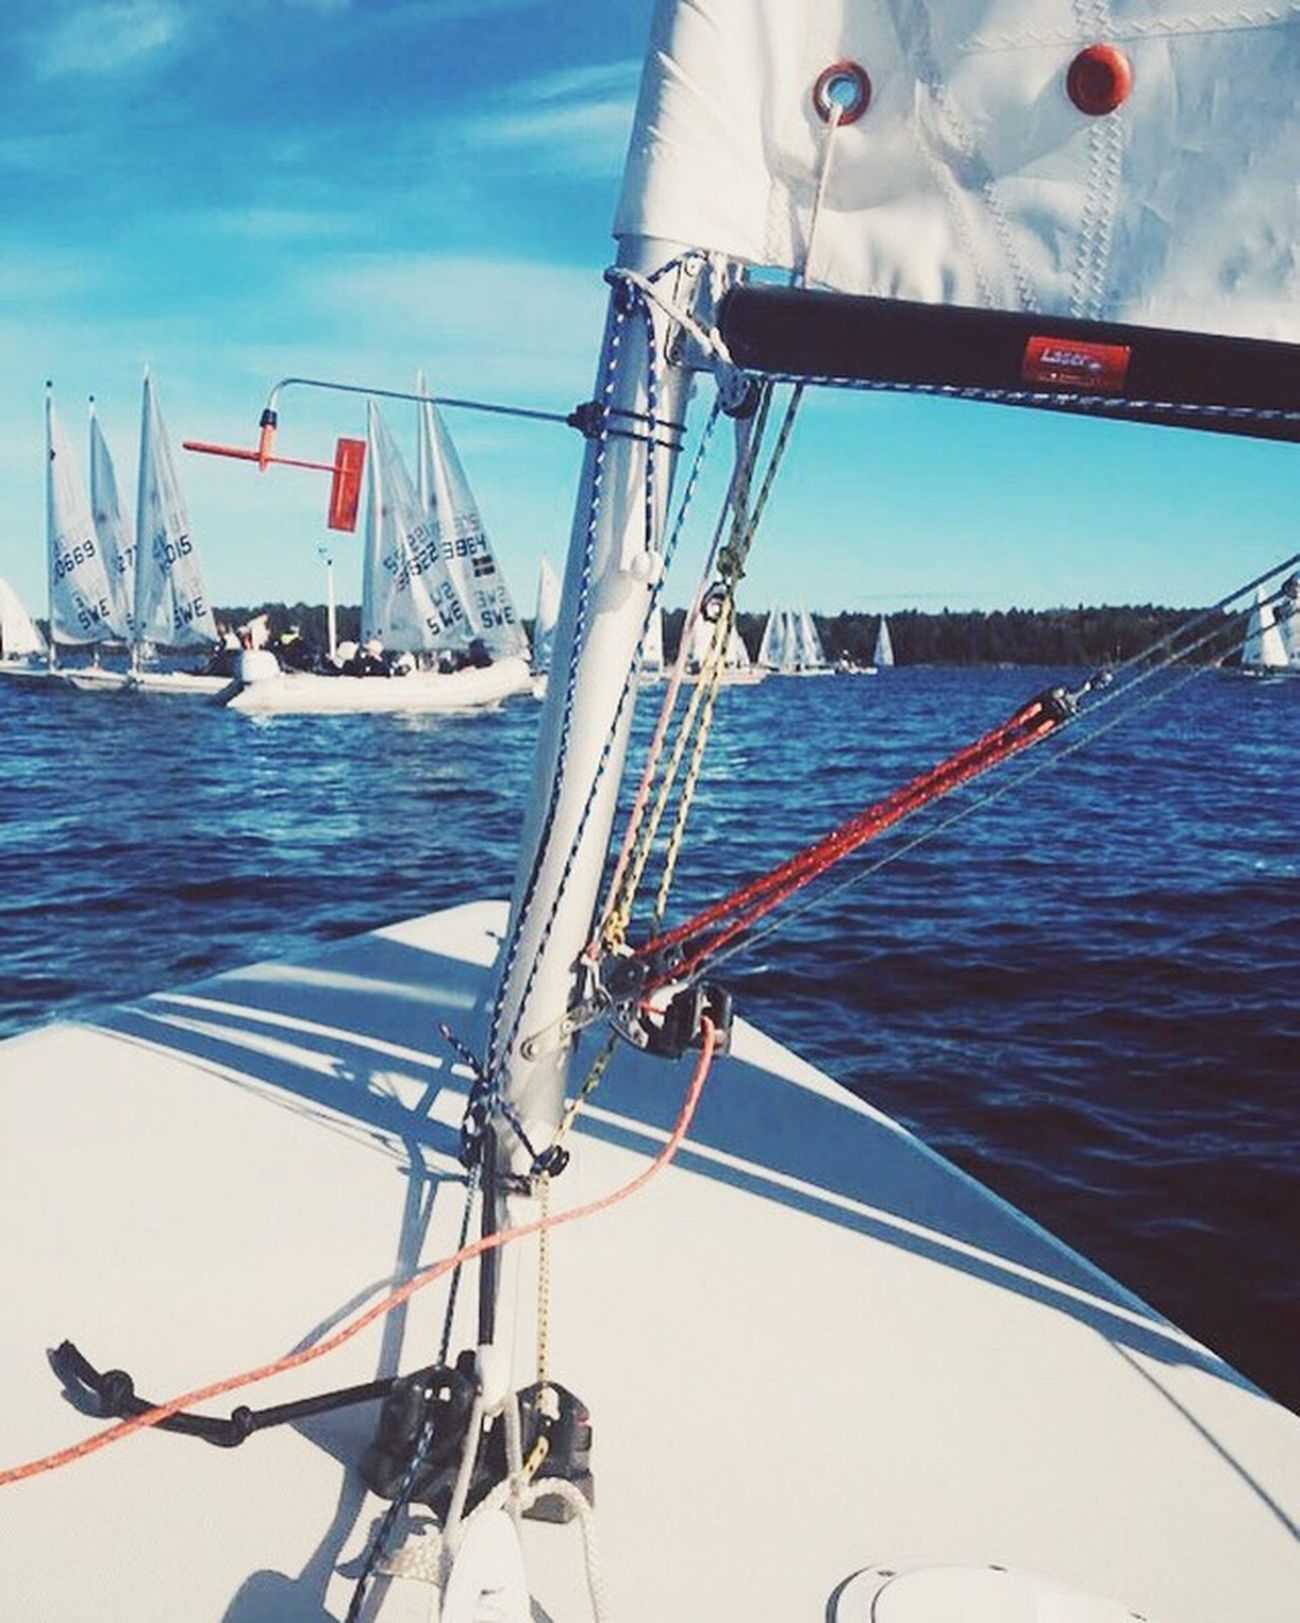 Water Sailing Sea Regatta